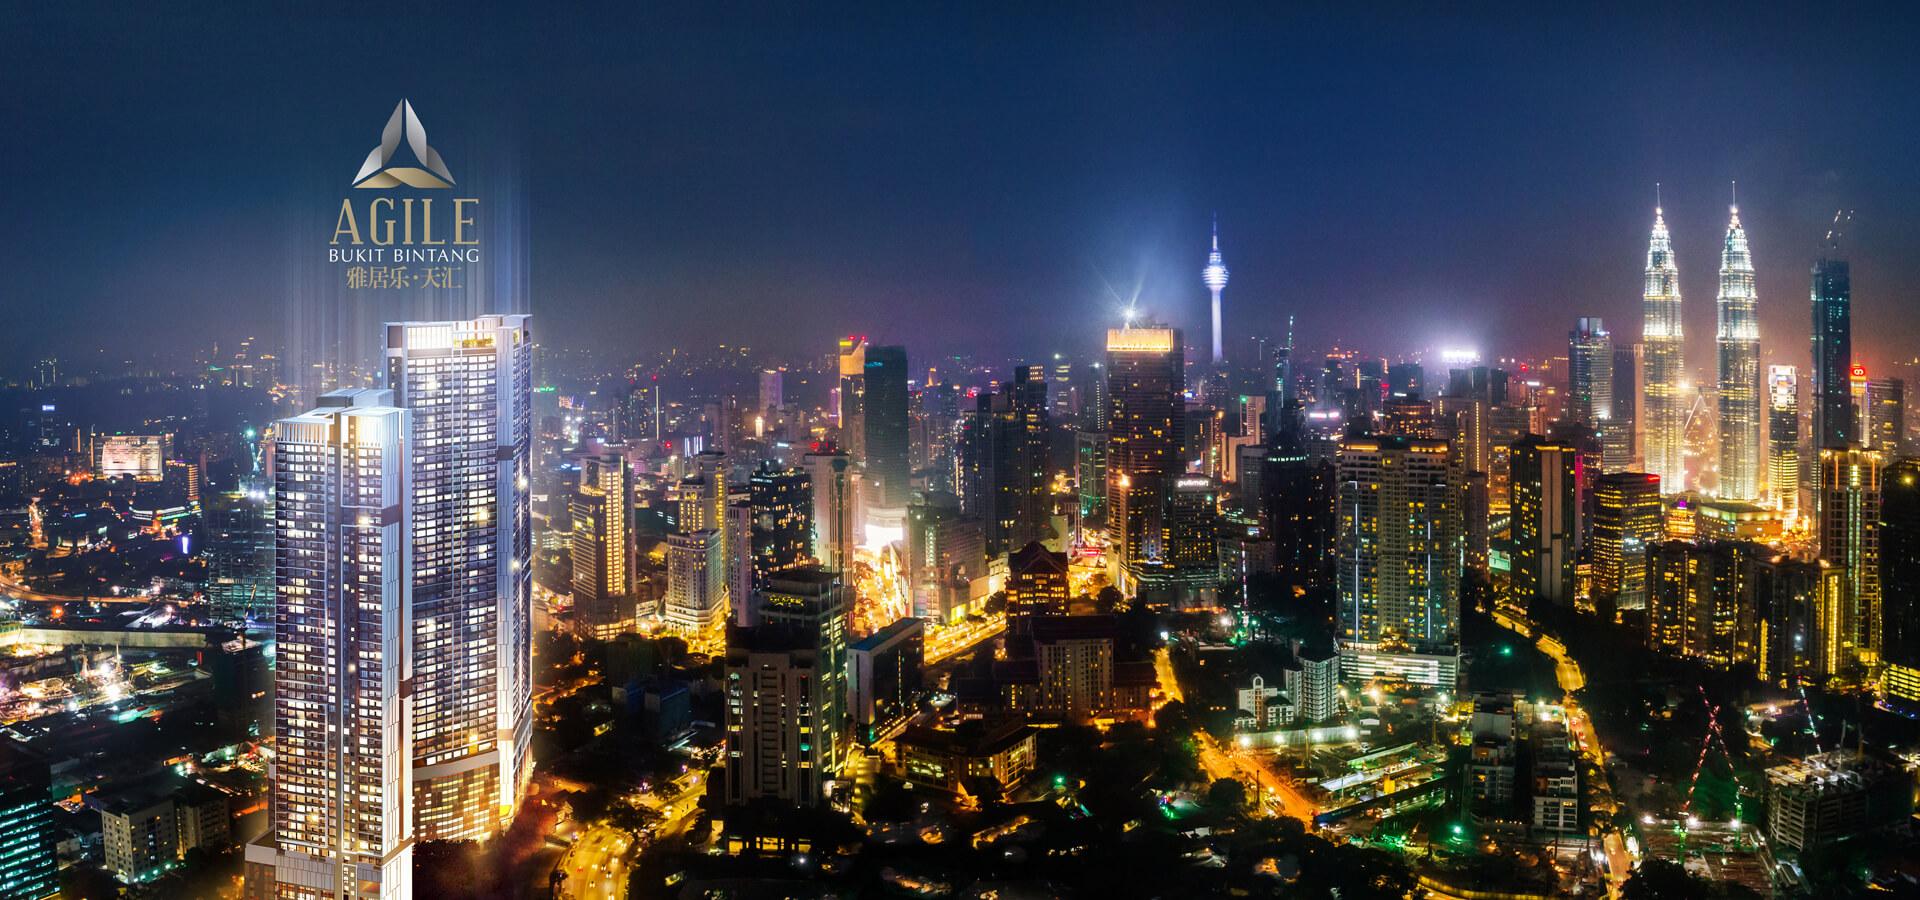 agile-bukit-bintang-facing-klcc-view-night-facade